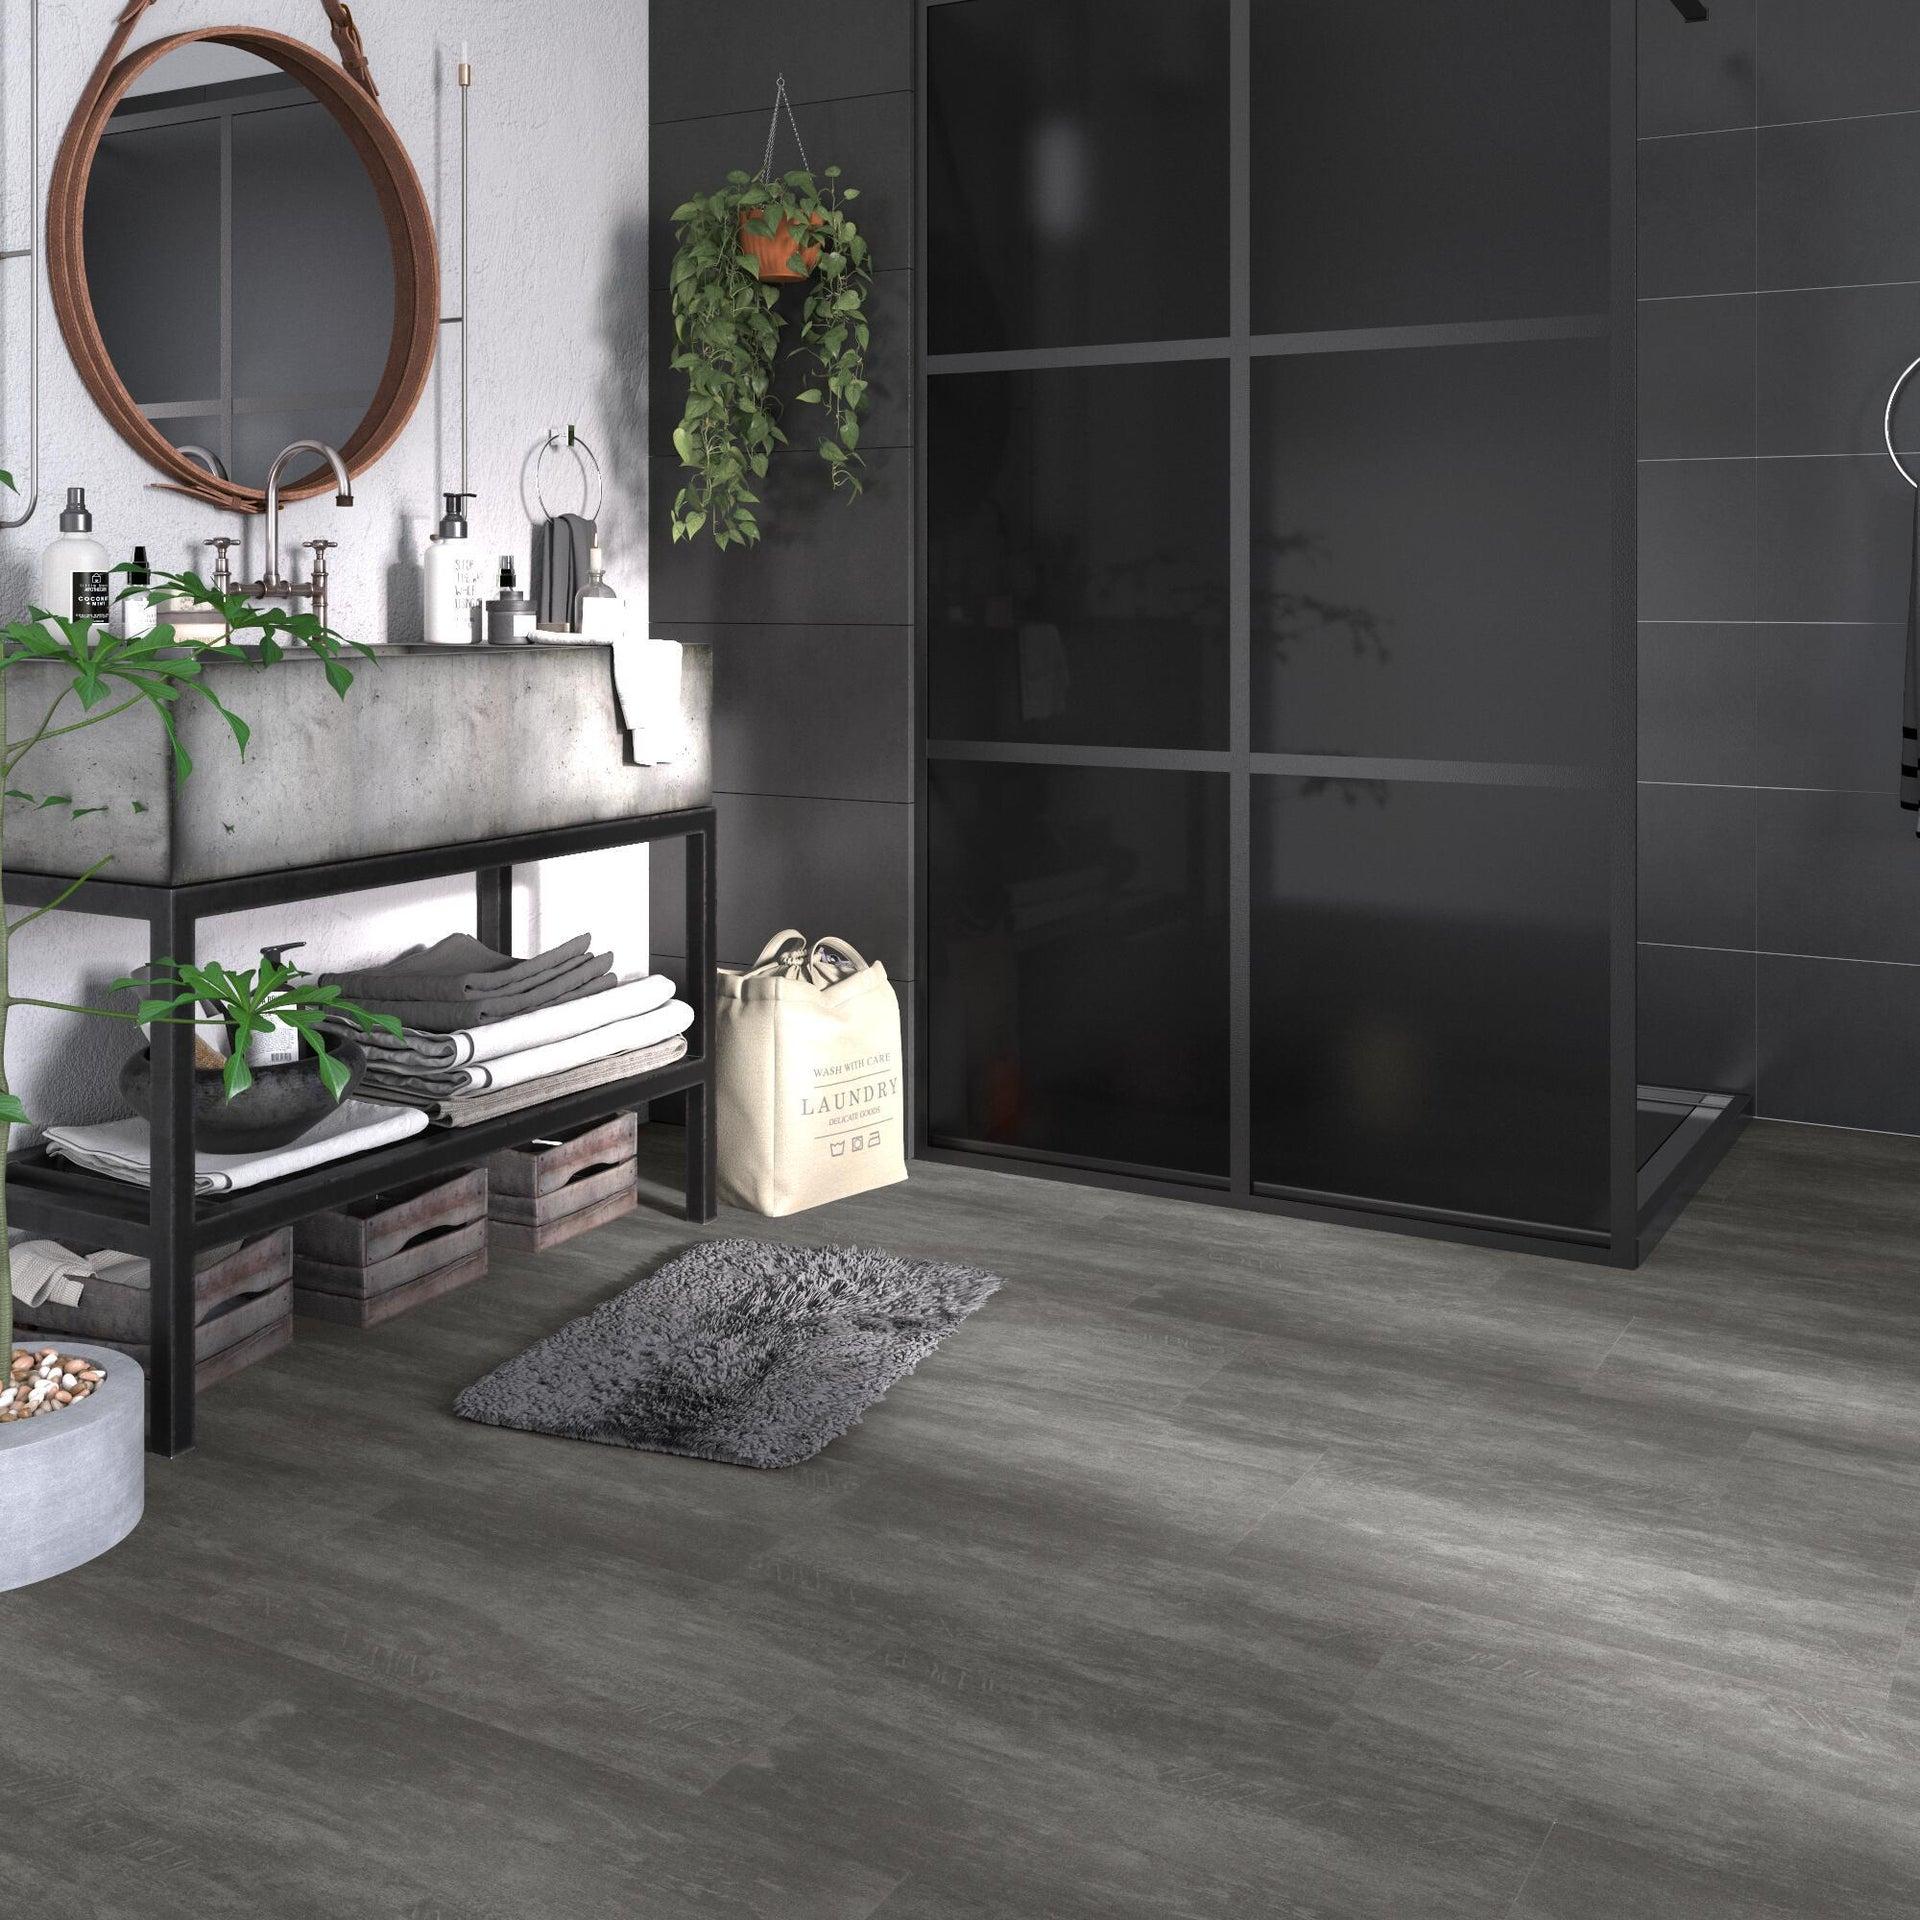 Pavimento PVC incastro Tolu Sp 4 mm grigio / argento - 14